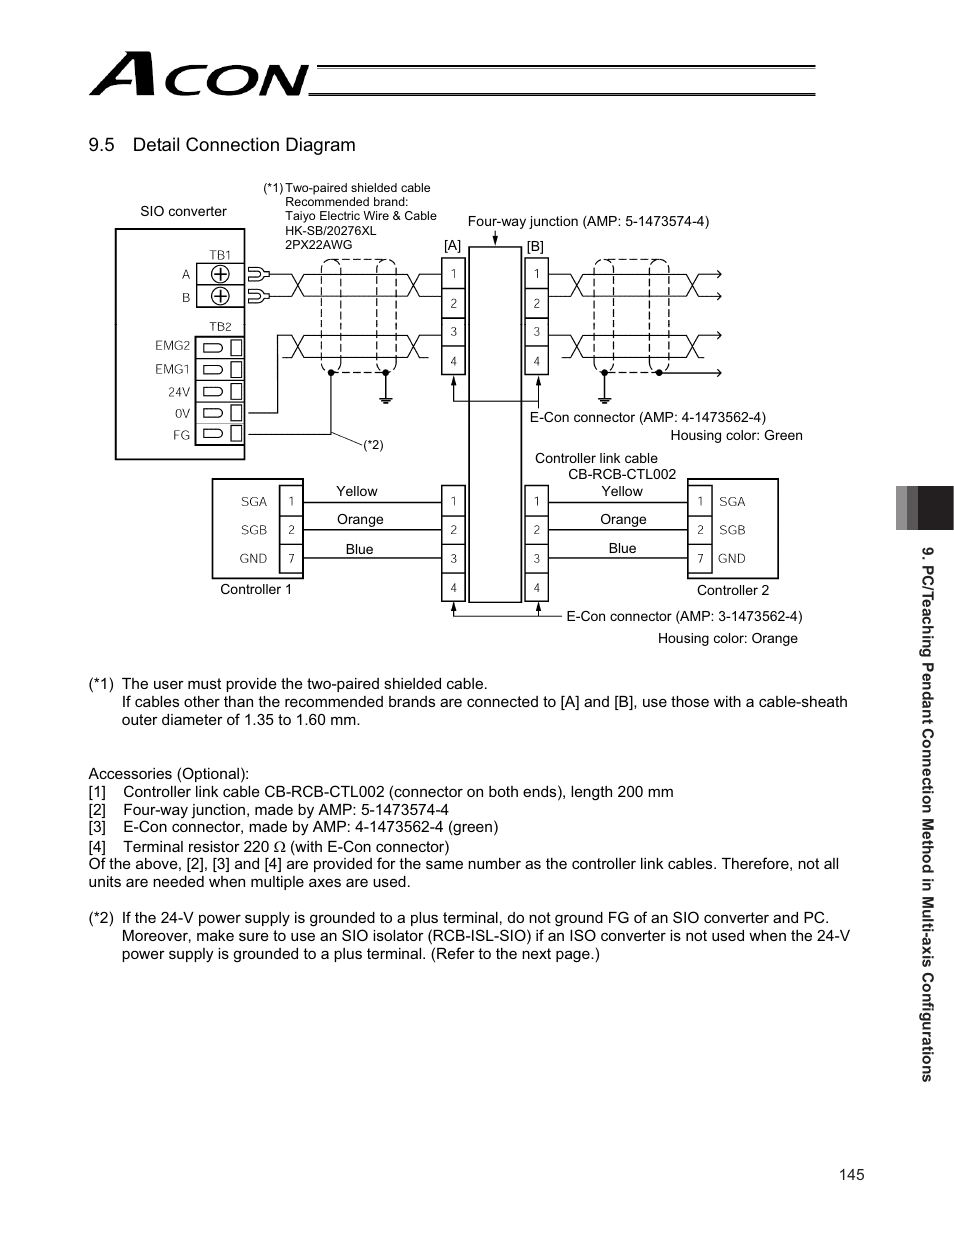 5 Detail Connection Diagram Iai America Acon Cg User Manual Page Isl Wiring 159 196